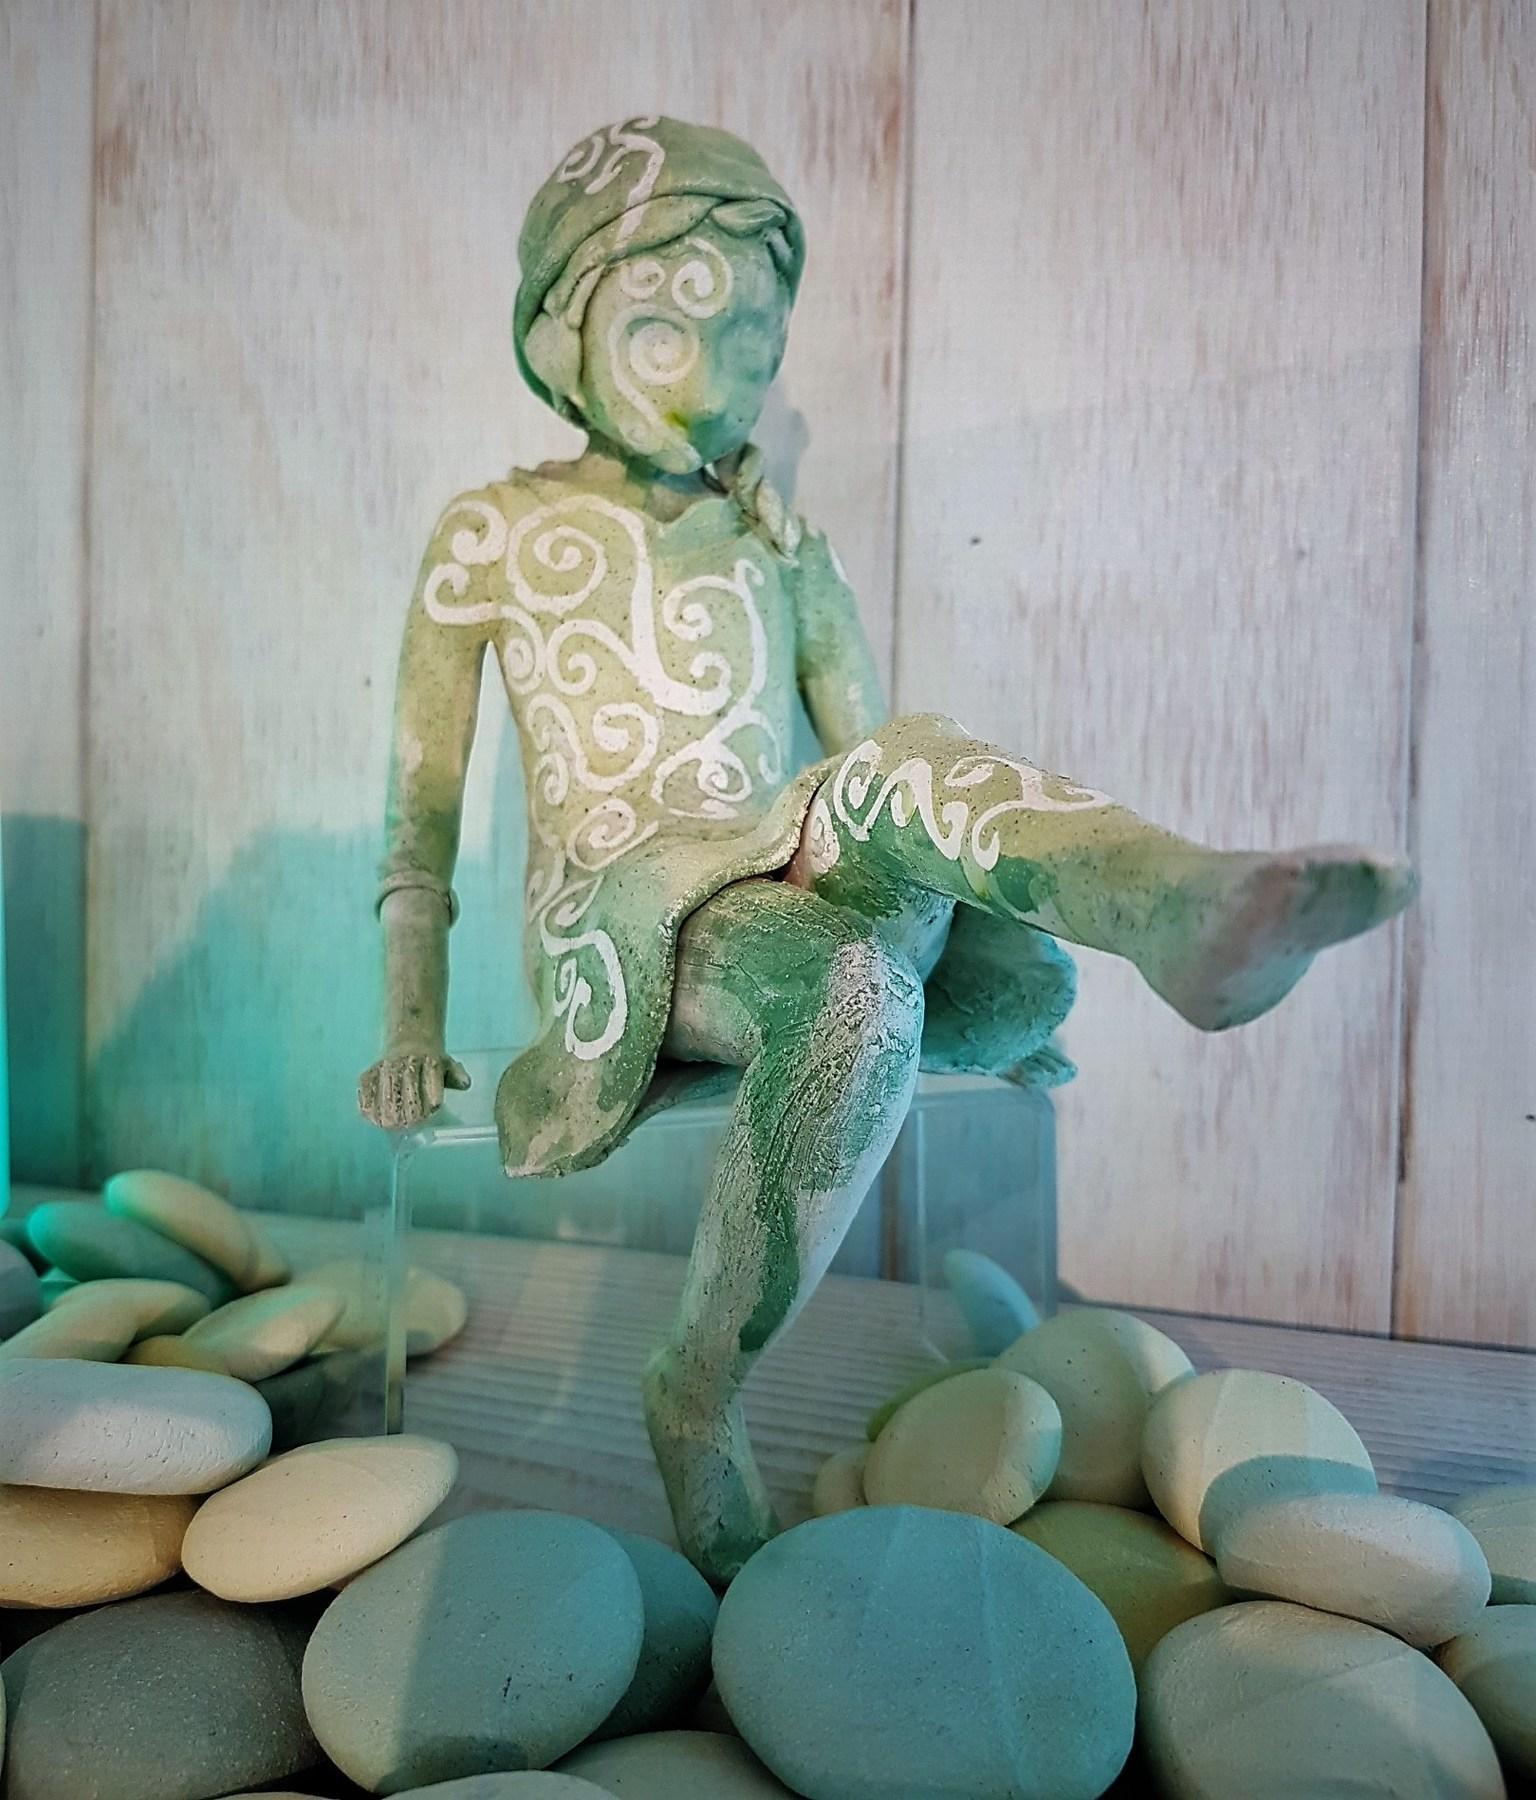 Untitled Figure II